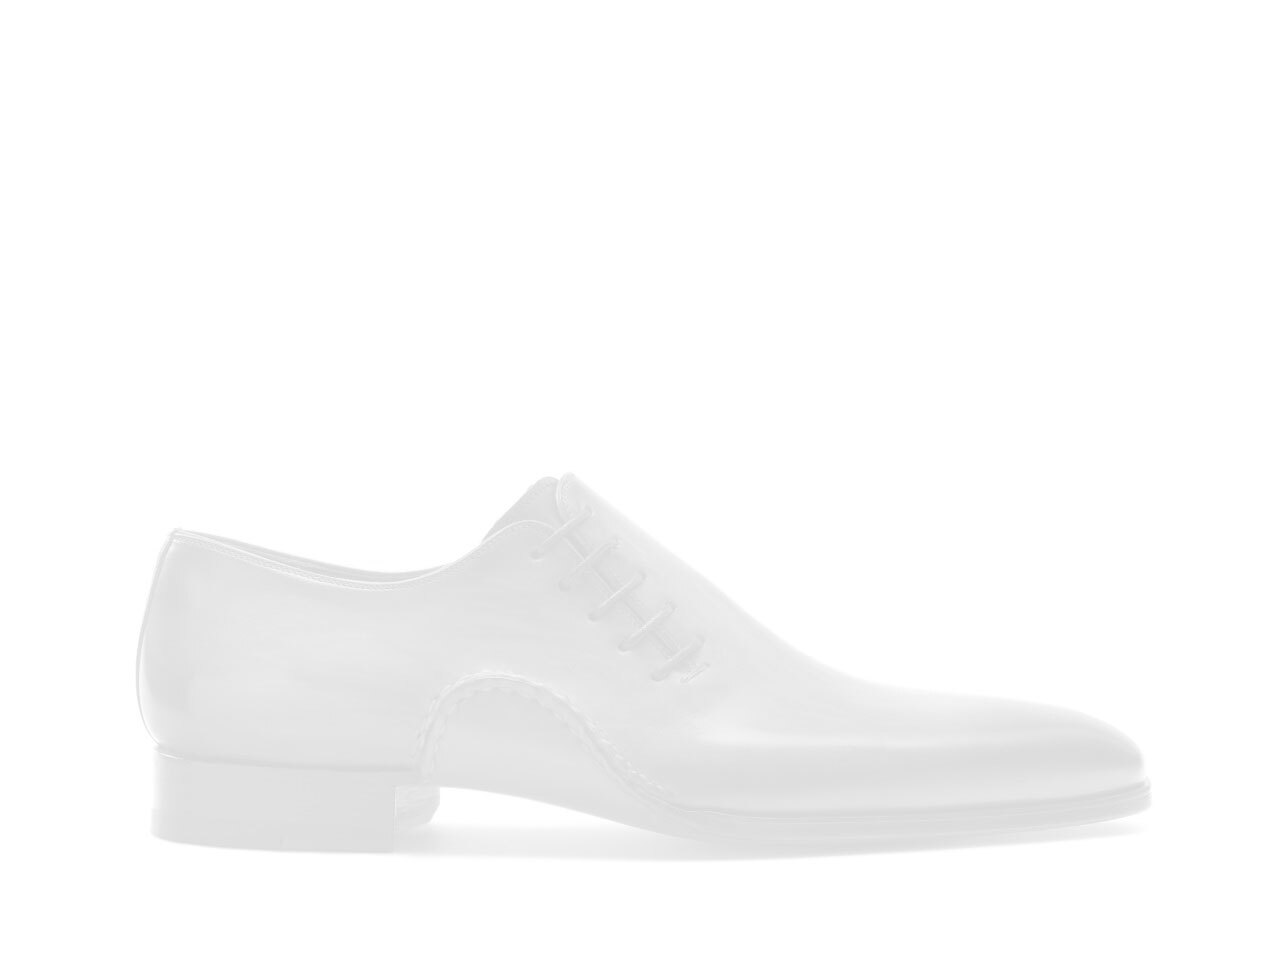 Sole of the Magnanni Segura Midbrown Men's Oxford Shoes